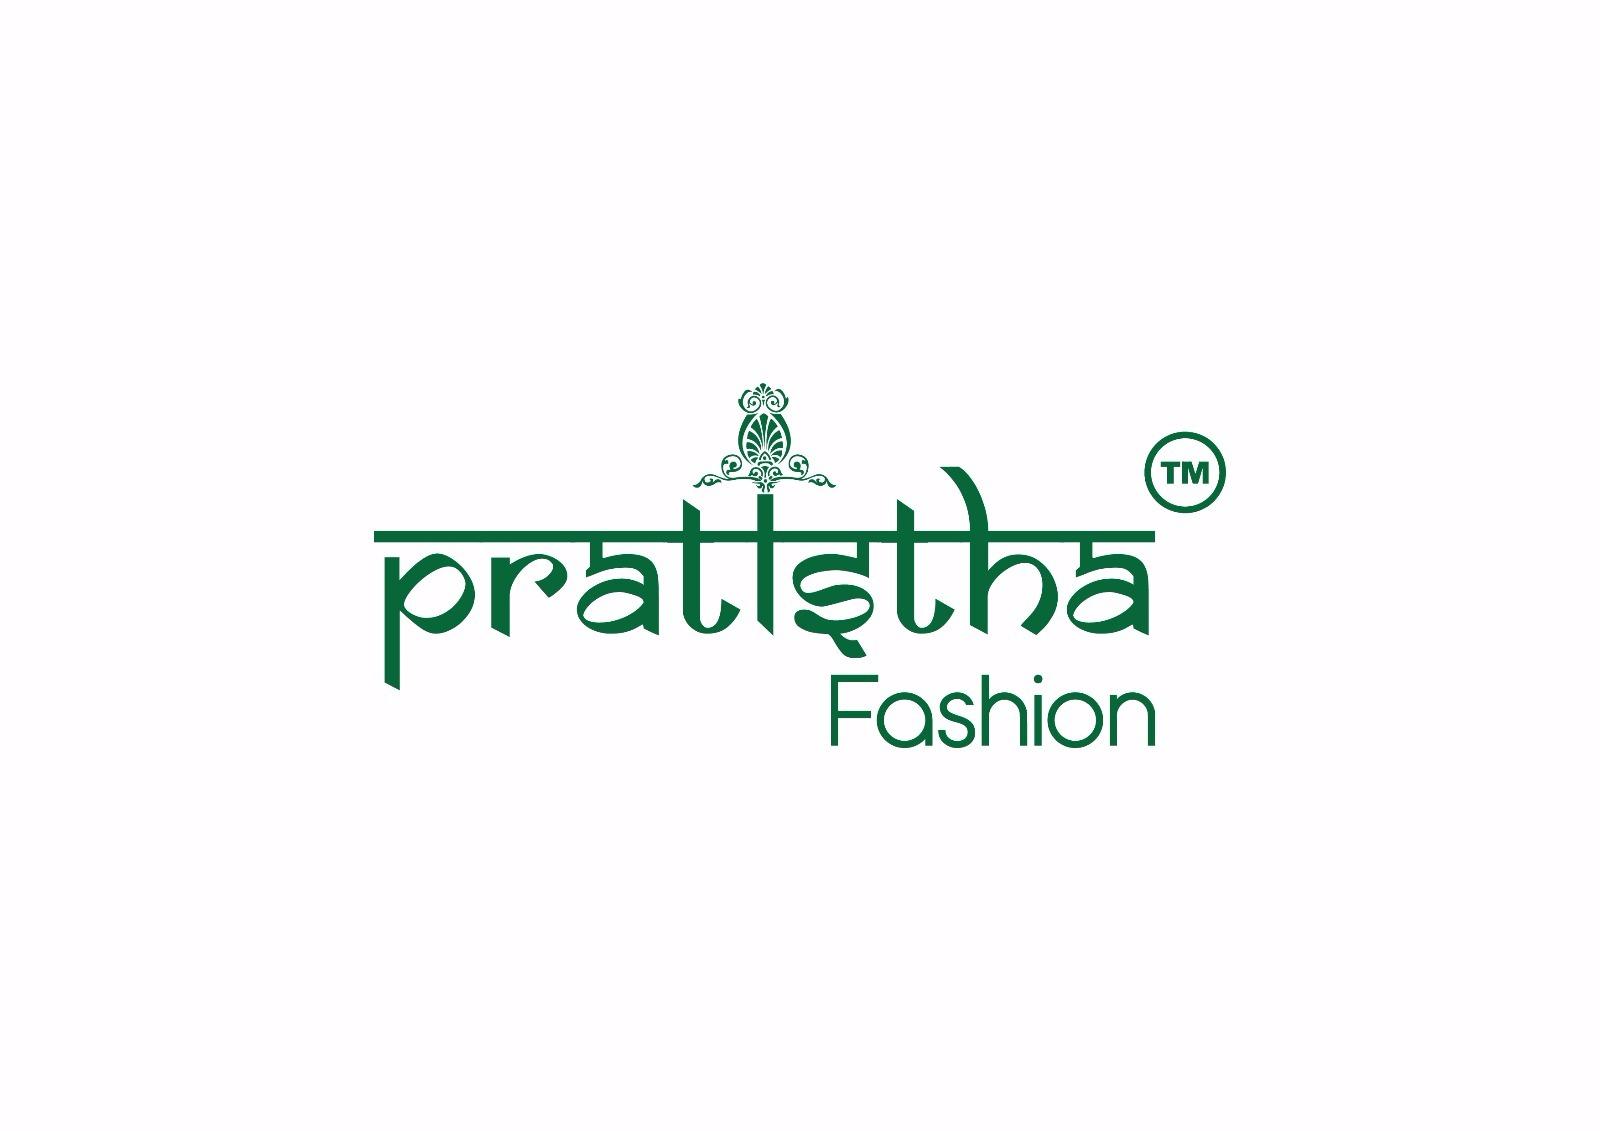 Pratistha Fashion